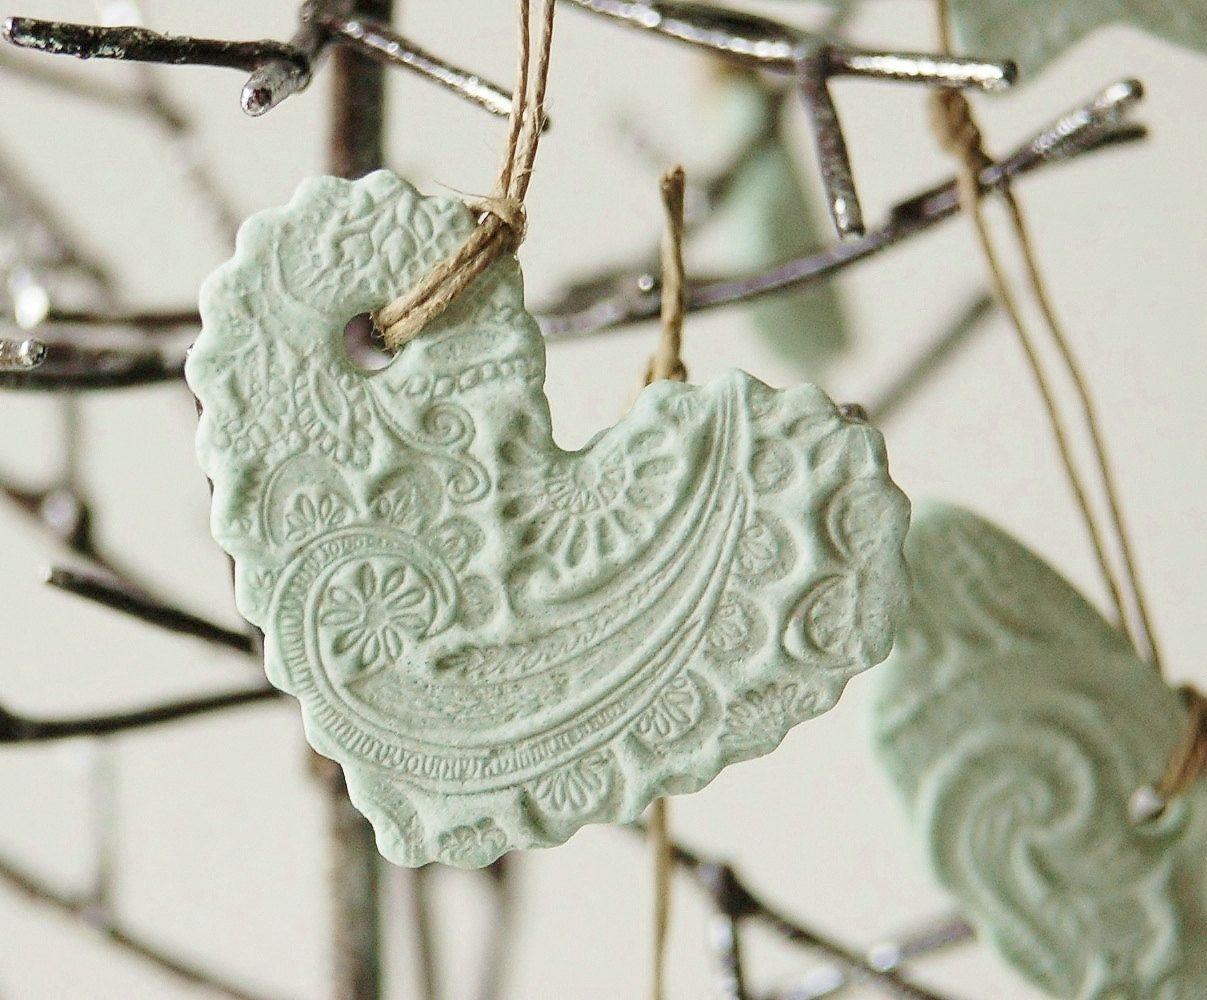 Ornament shabby chic handmade salt dough home decor wedding teal